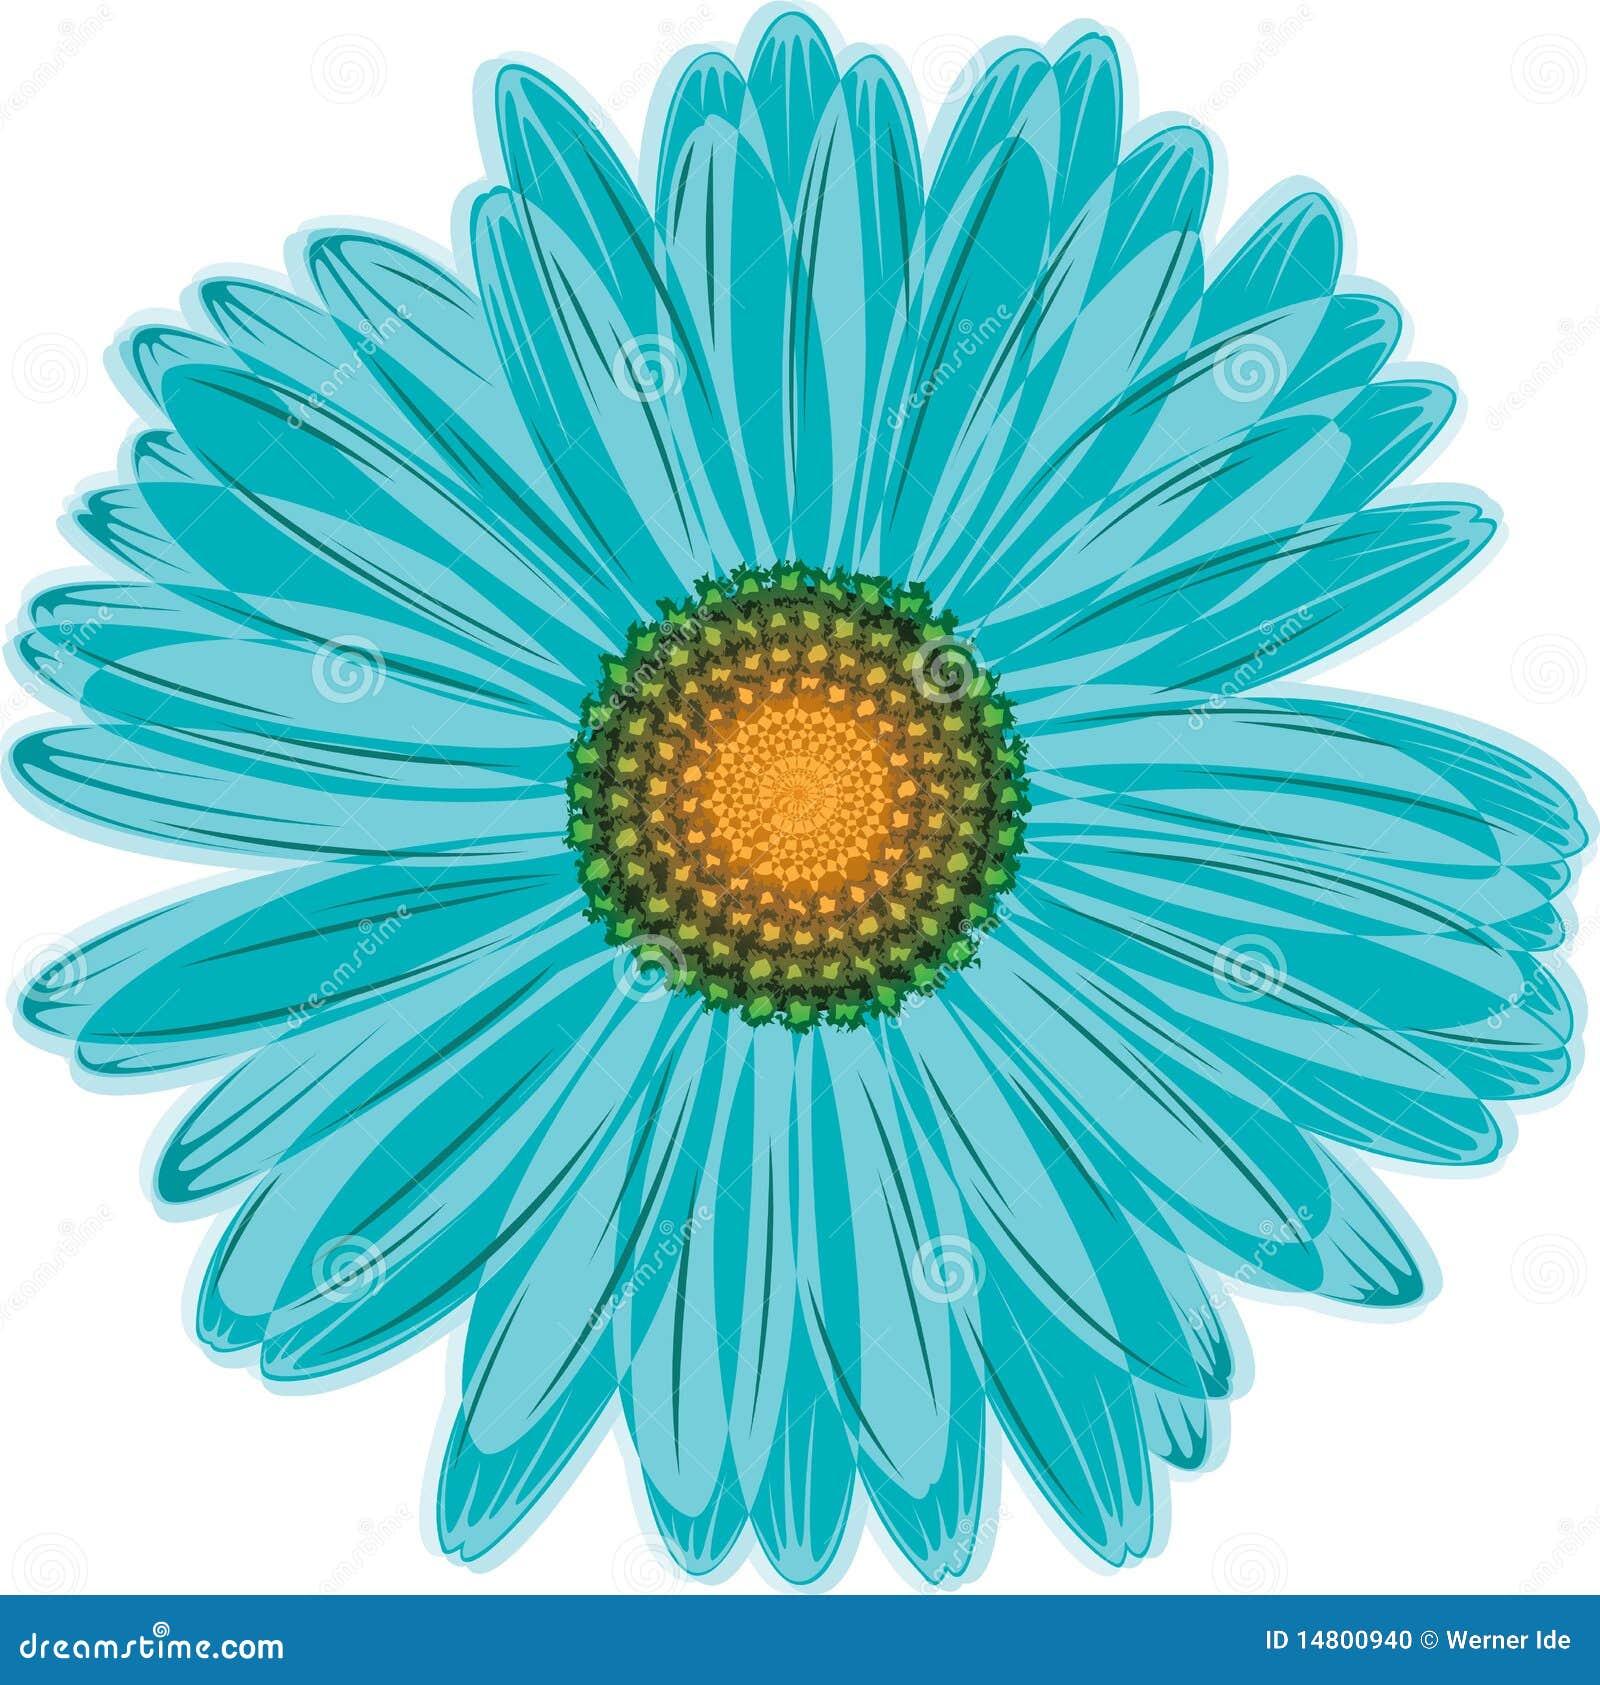 Aqua Blue Daisy Flower Stock Vector Illustration Of Daisy 14800940